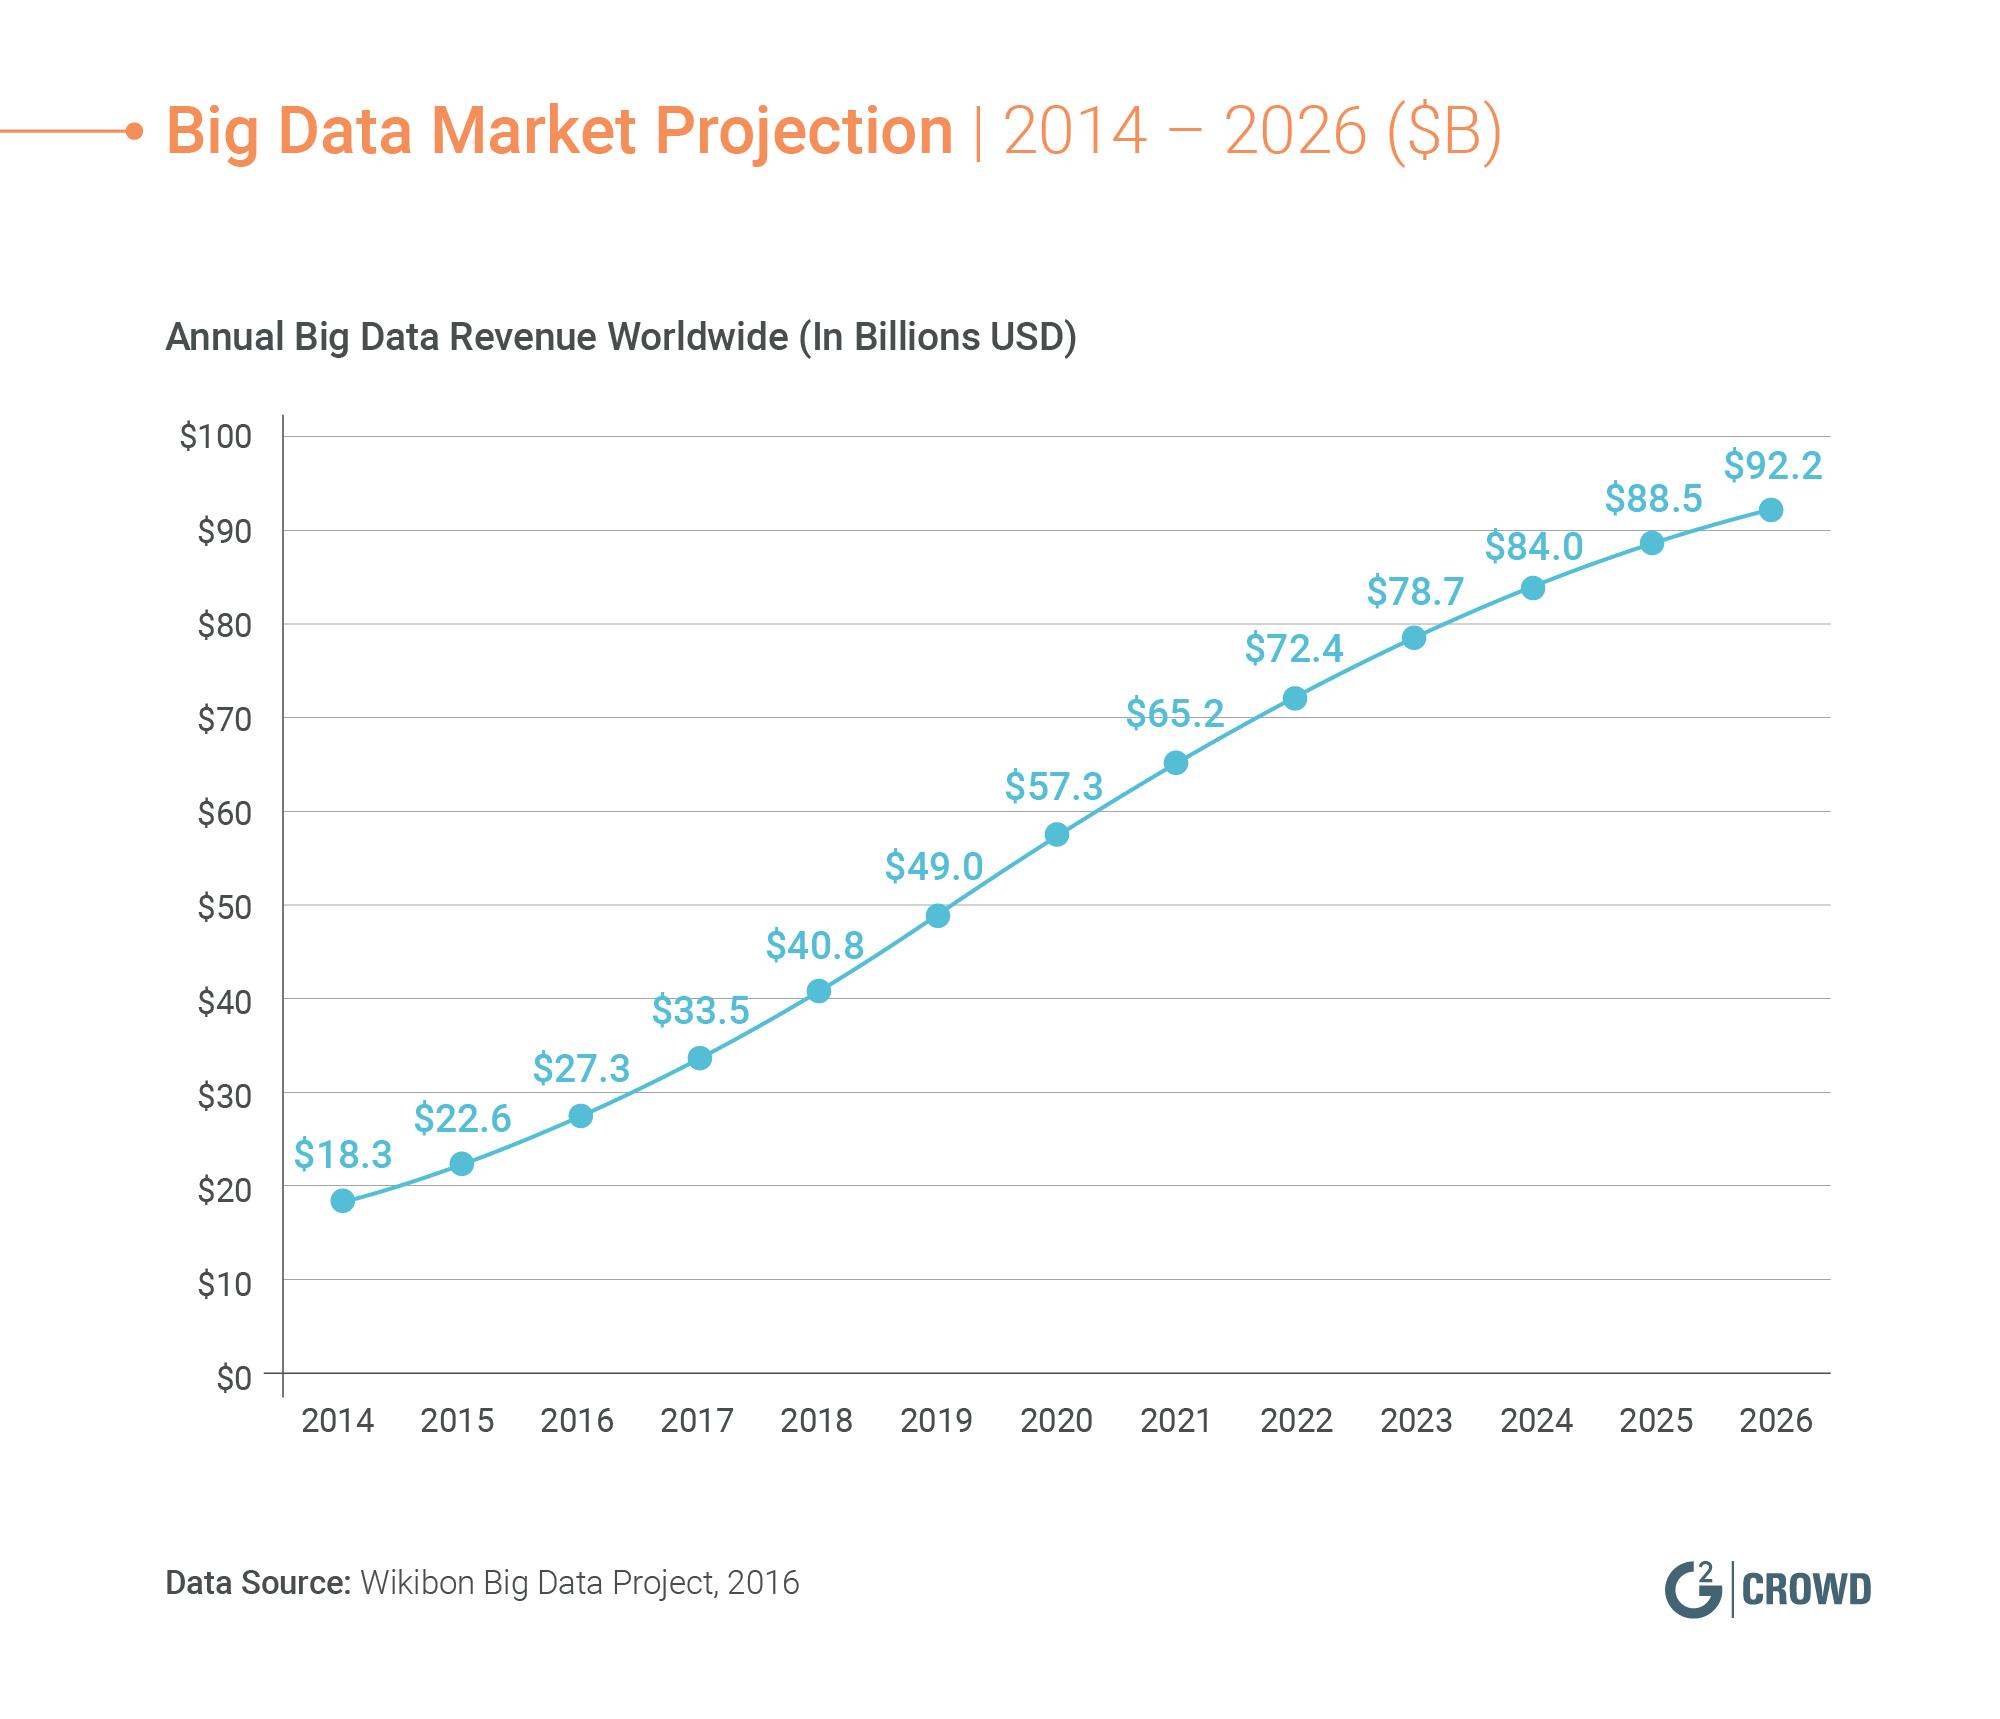 Big-Data-Market-Projection